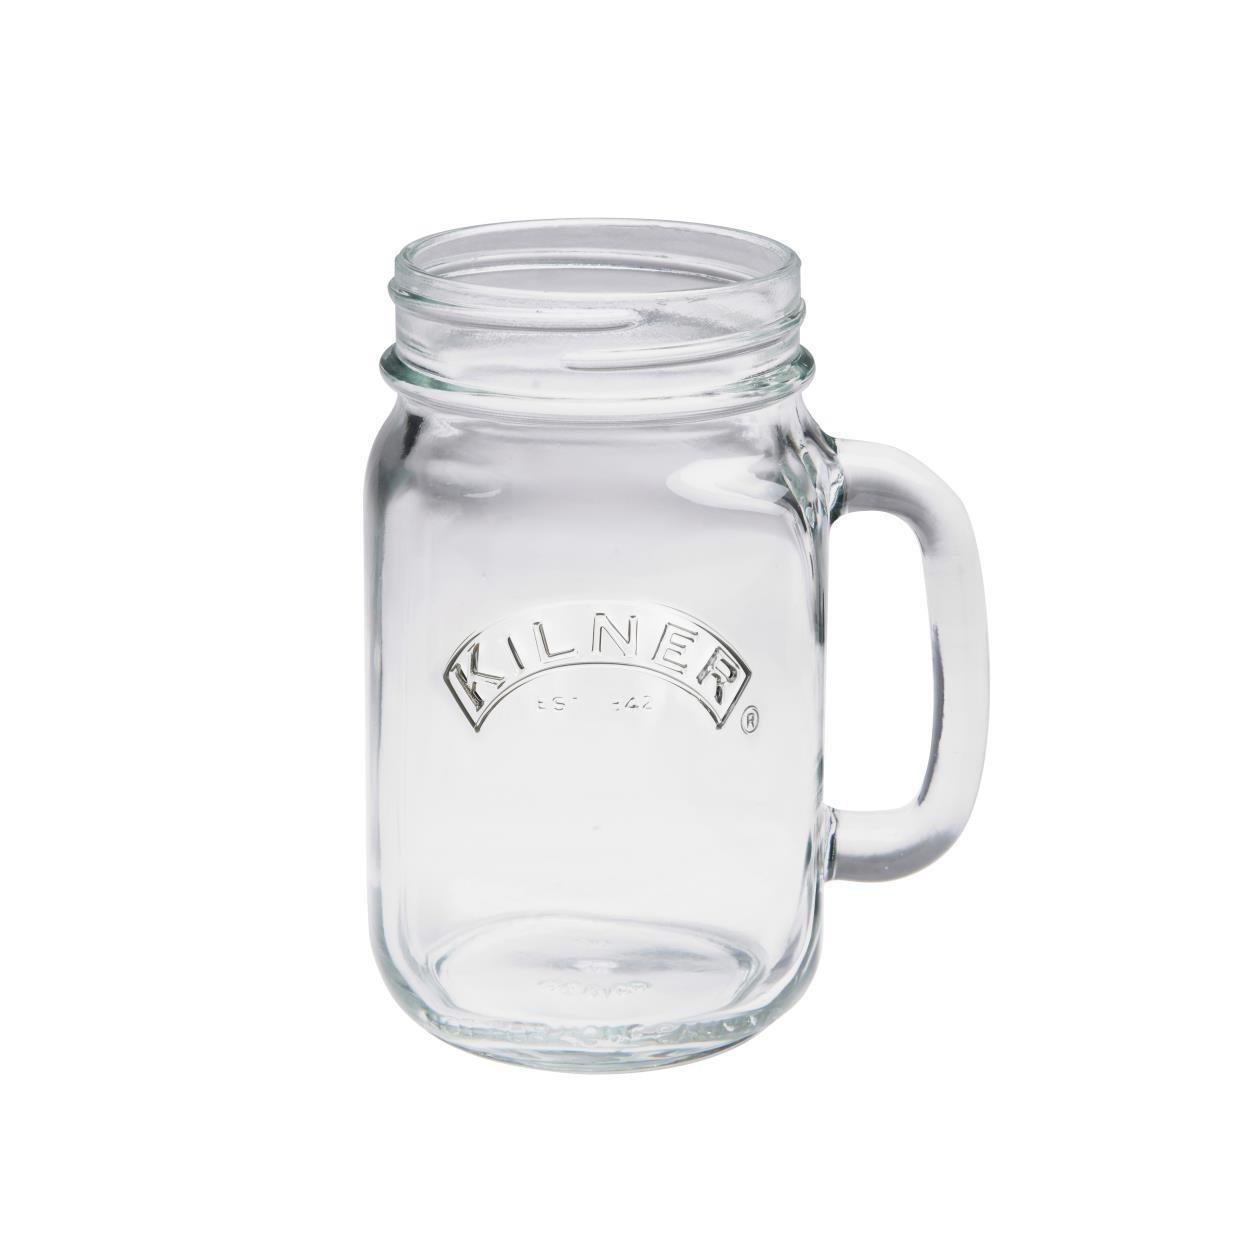 0.5ltr Kilner Clear Handled Drinking Jar